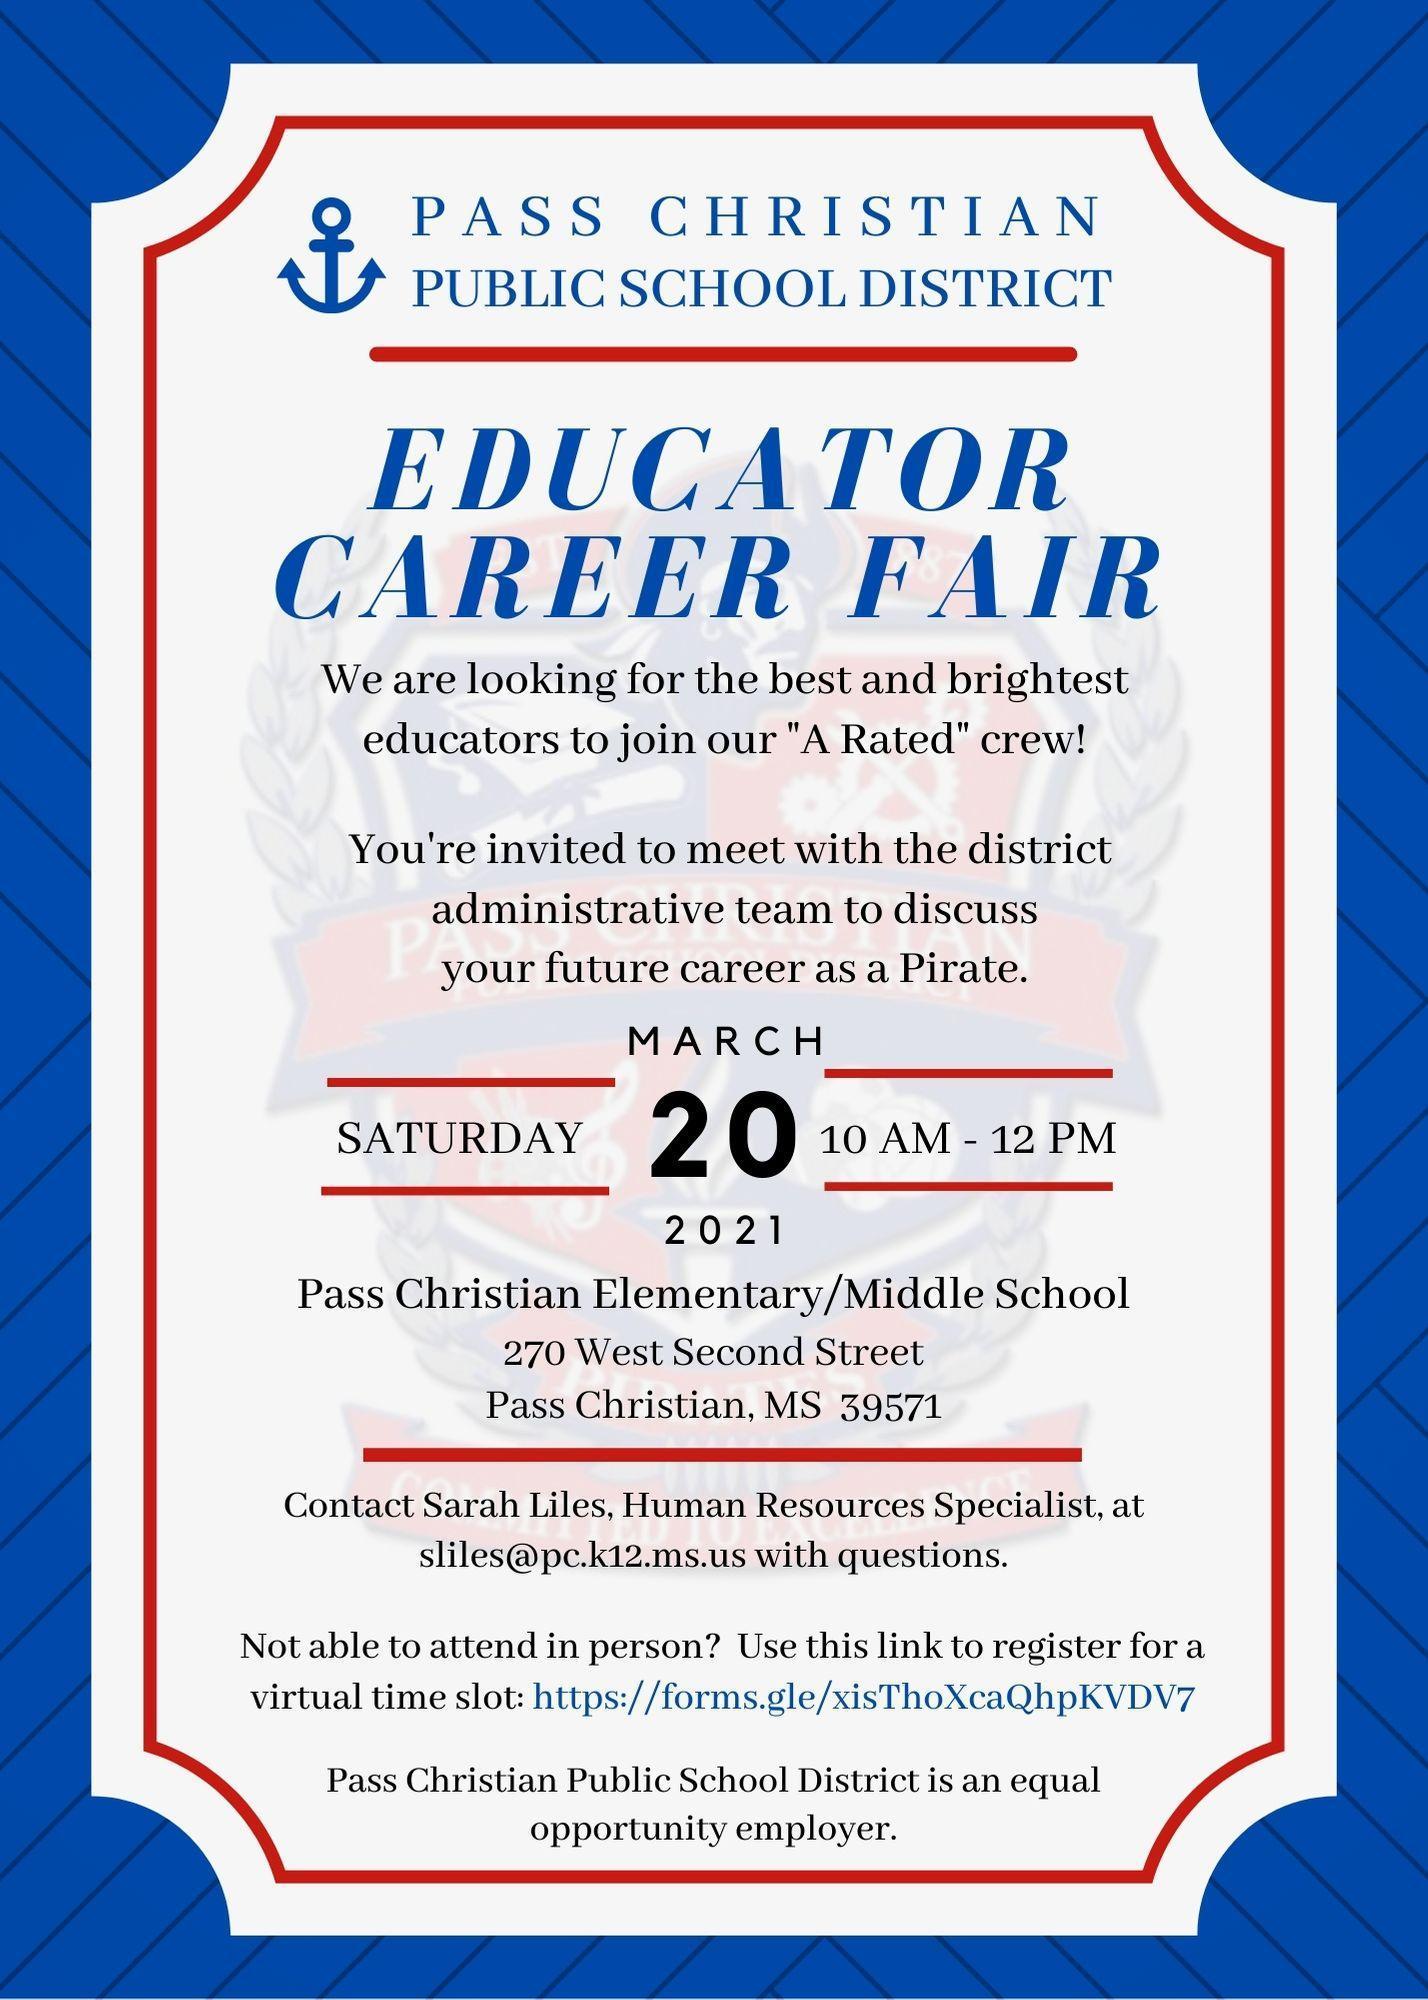 Educator Career Fair Invitation: March 20, 2021, at 10 am